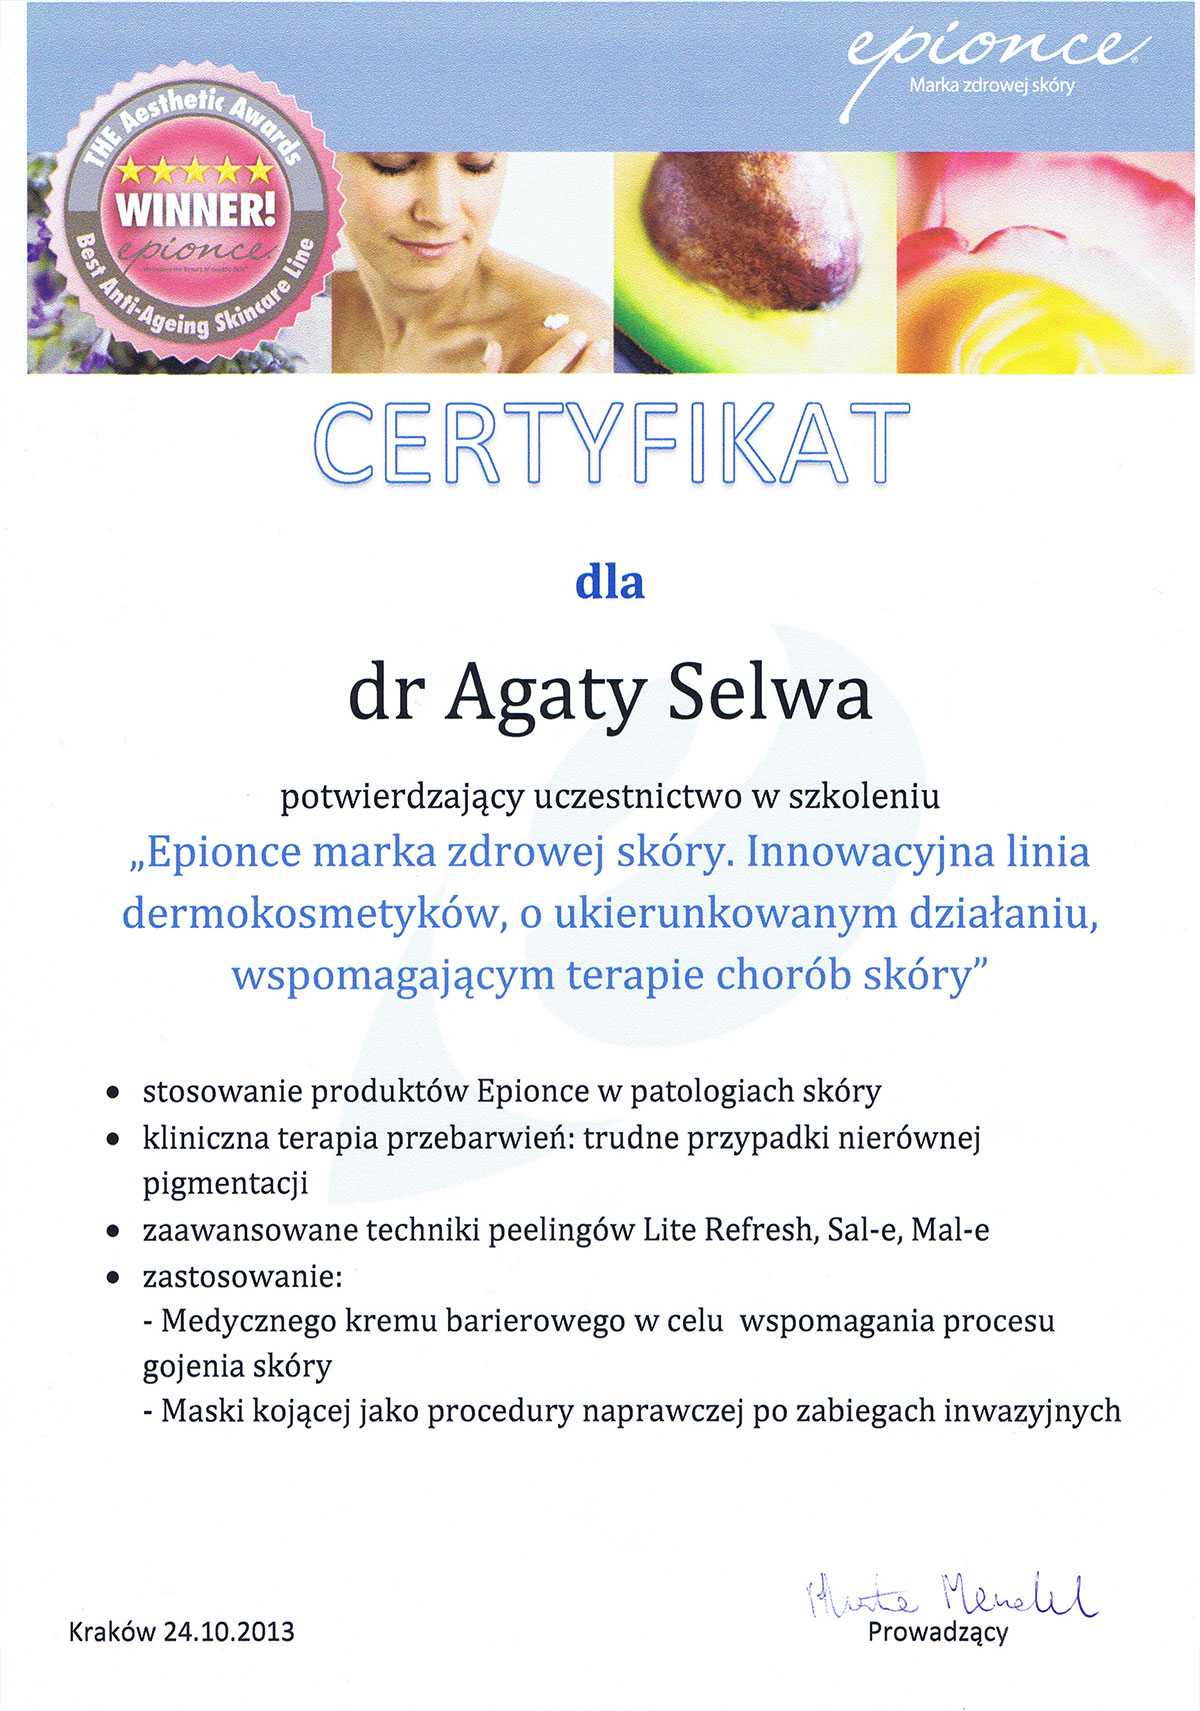 certyfikat epionce zdrowa skóra dr agata selwa